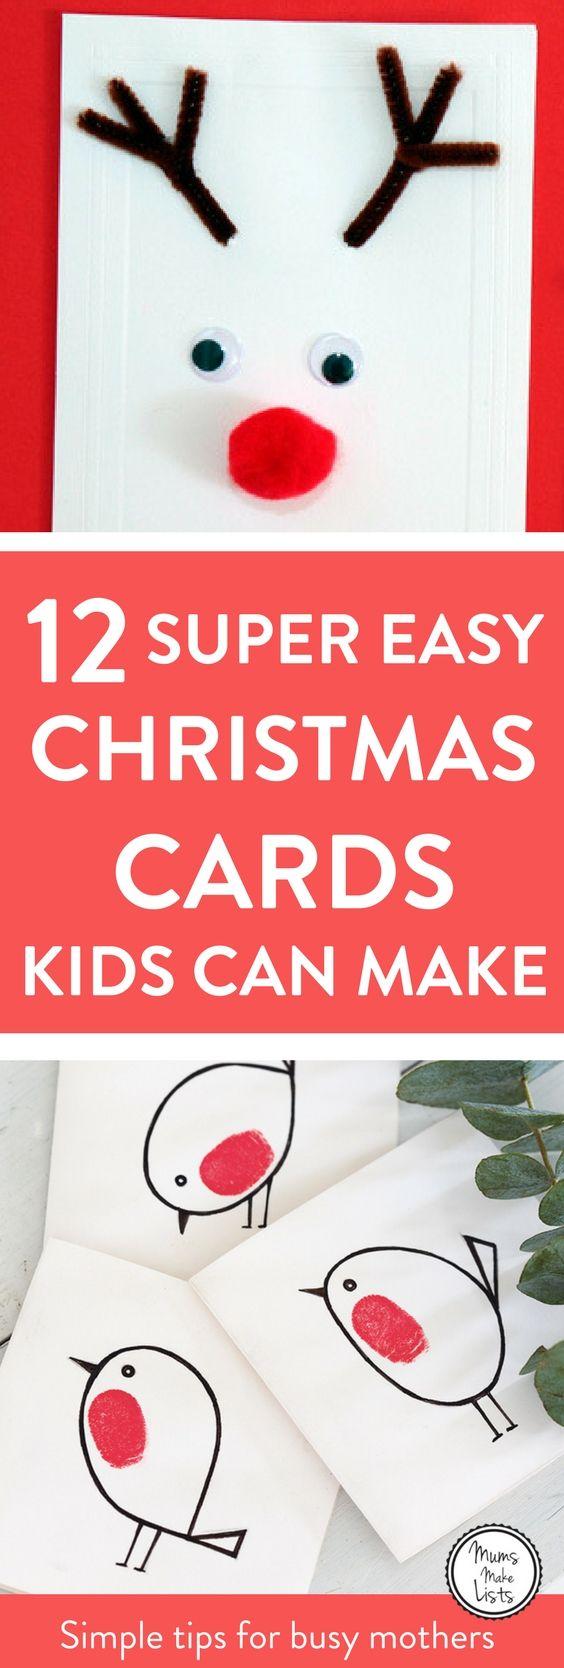 12 EASY homemade Christmas card ideas for kids Childrens